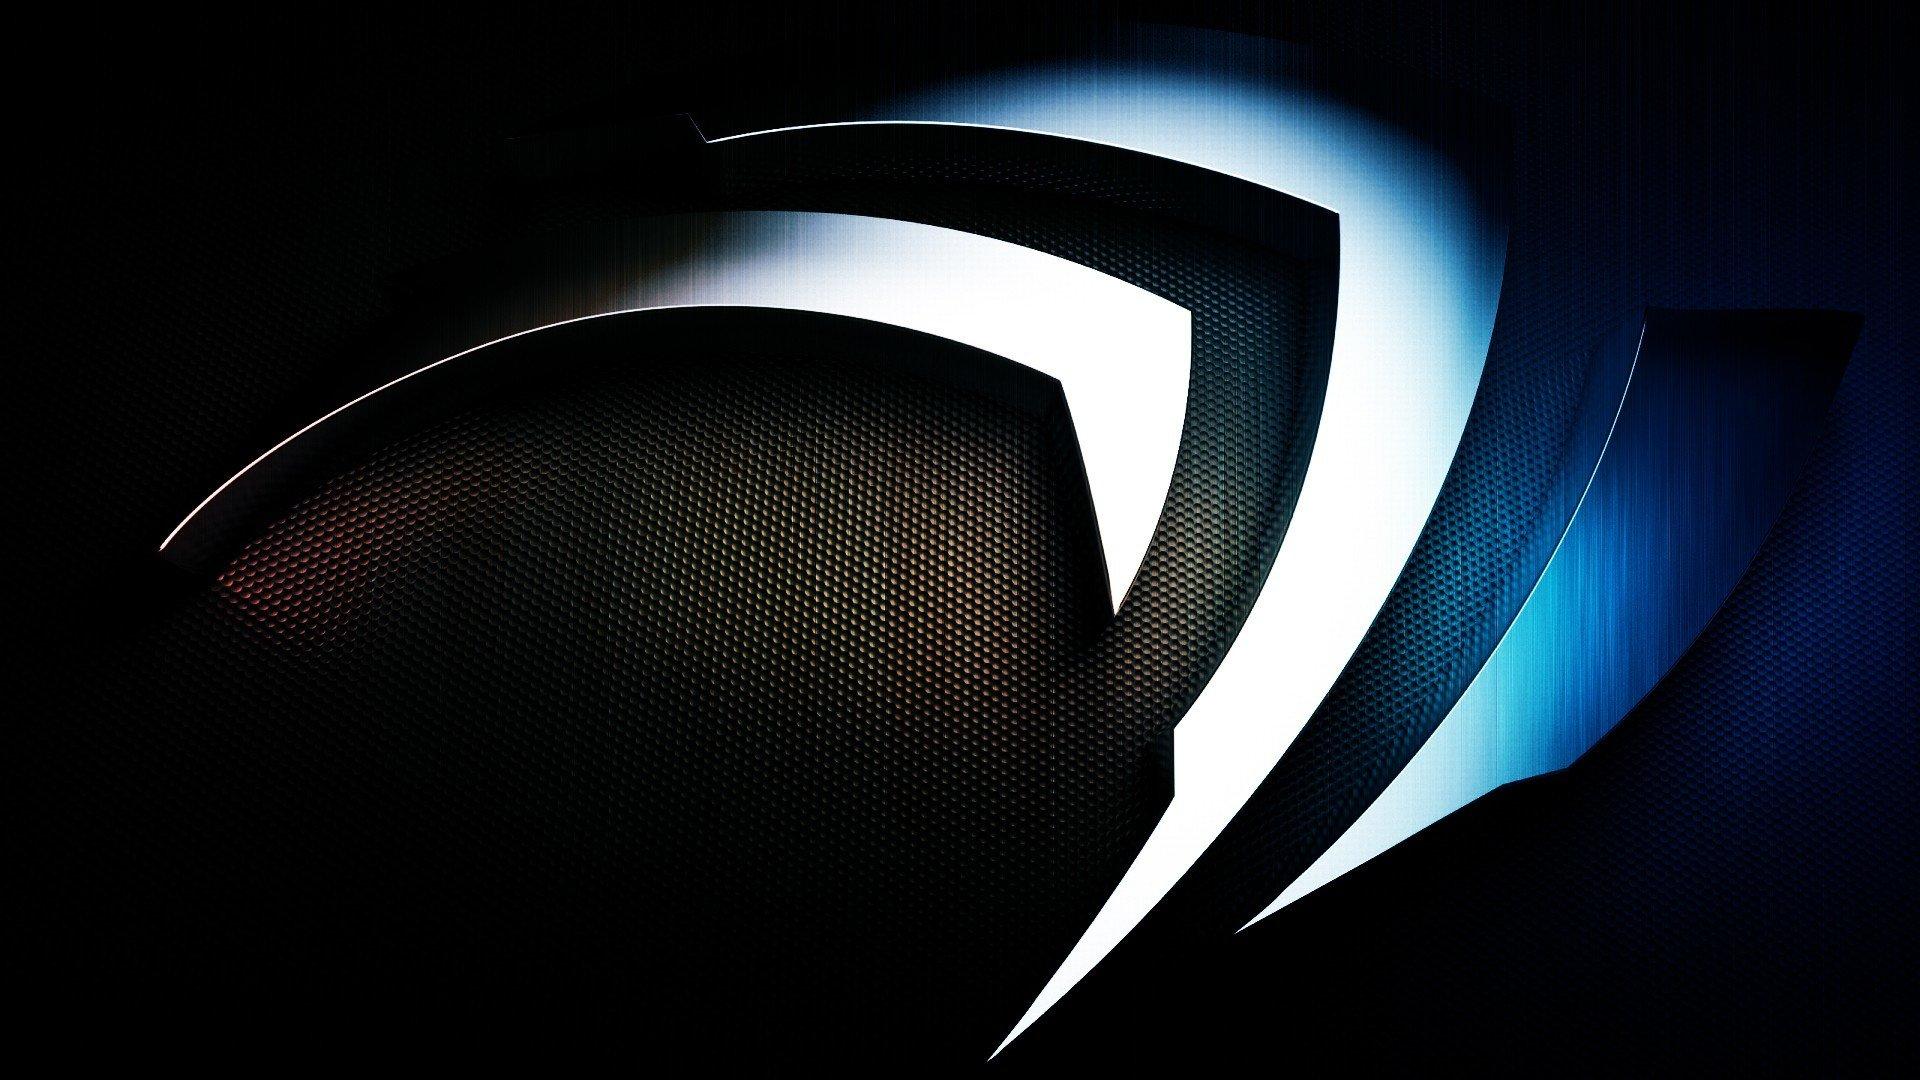 Nvidia wallpapers 1920x1080 full hd 1080p desktop - 1920x1080 wallpaper nvidia ...